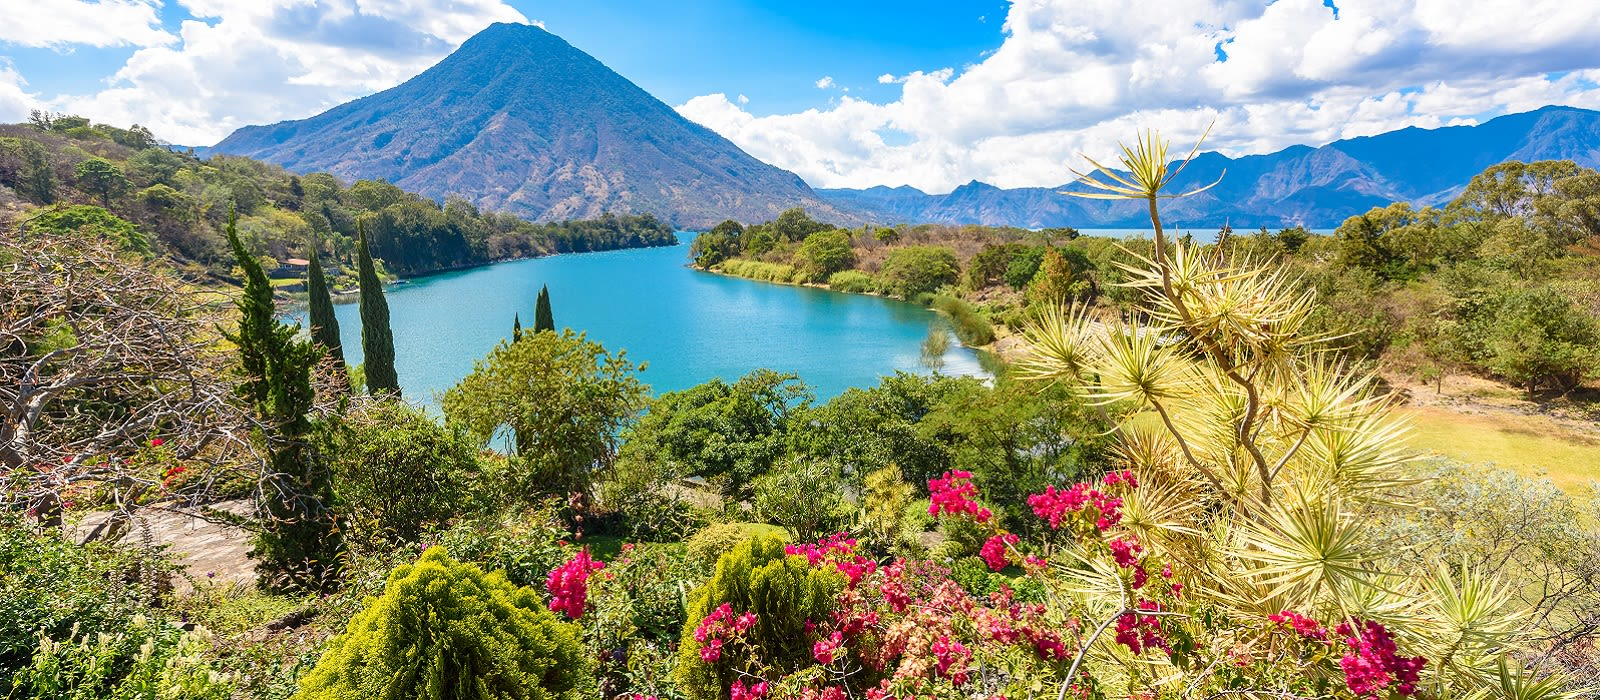 Destination Lake Atitlan Guatemala